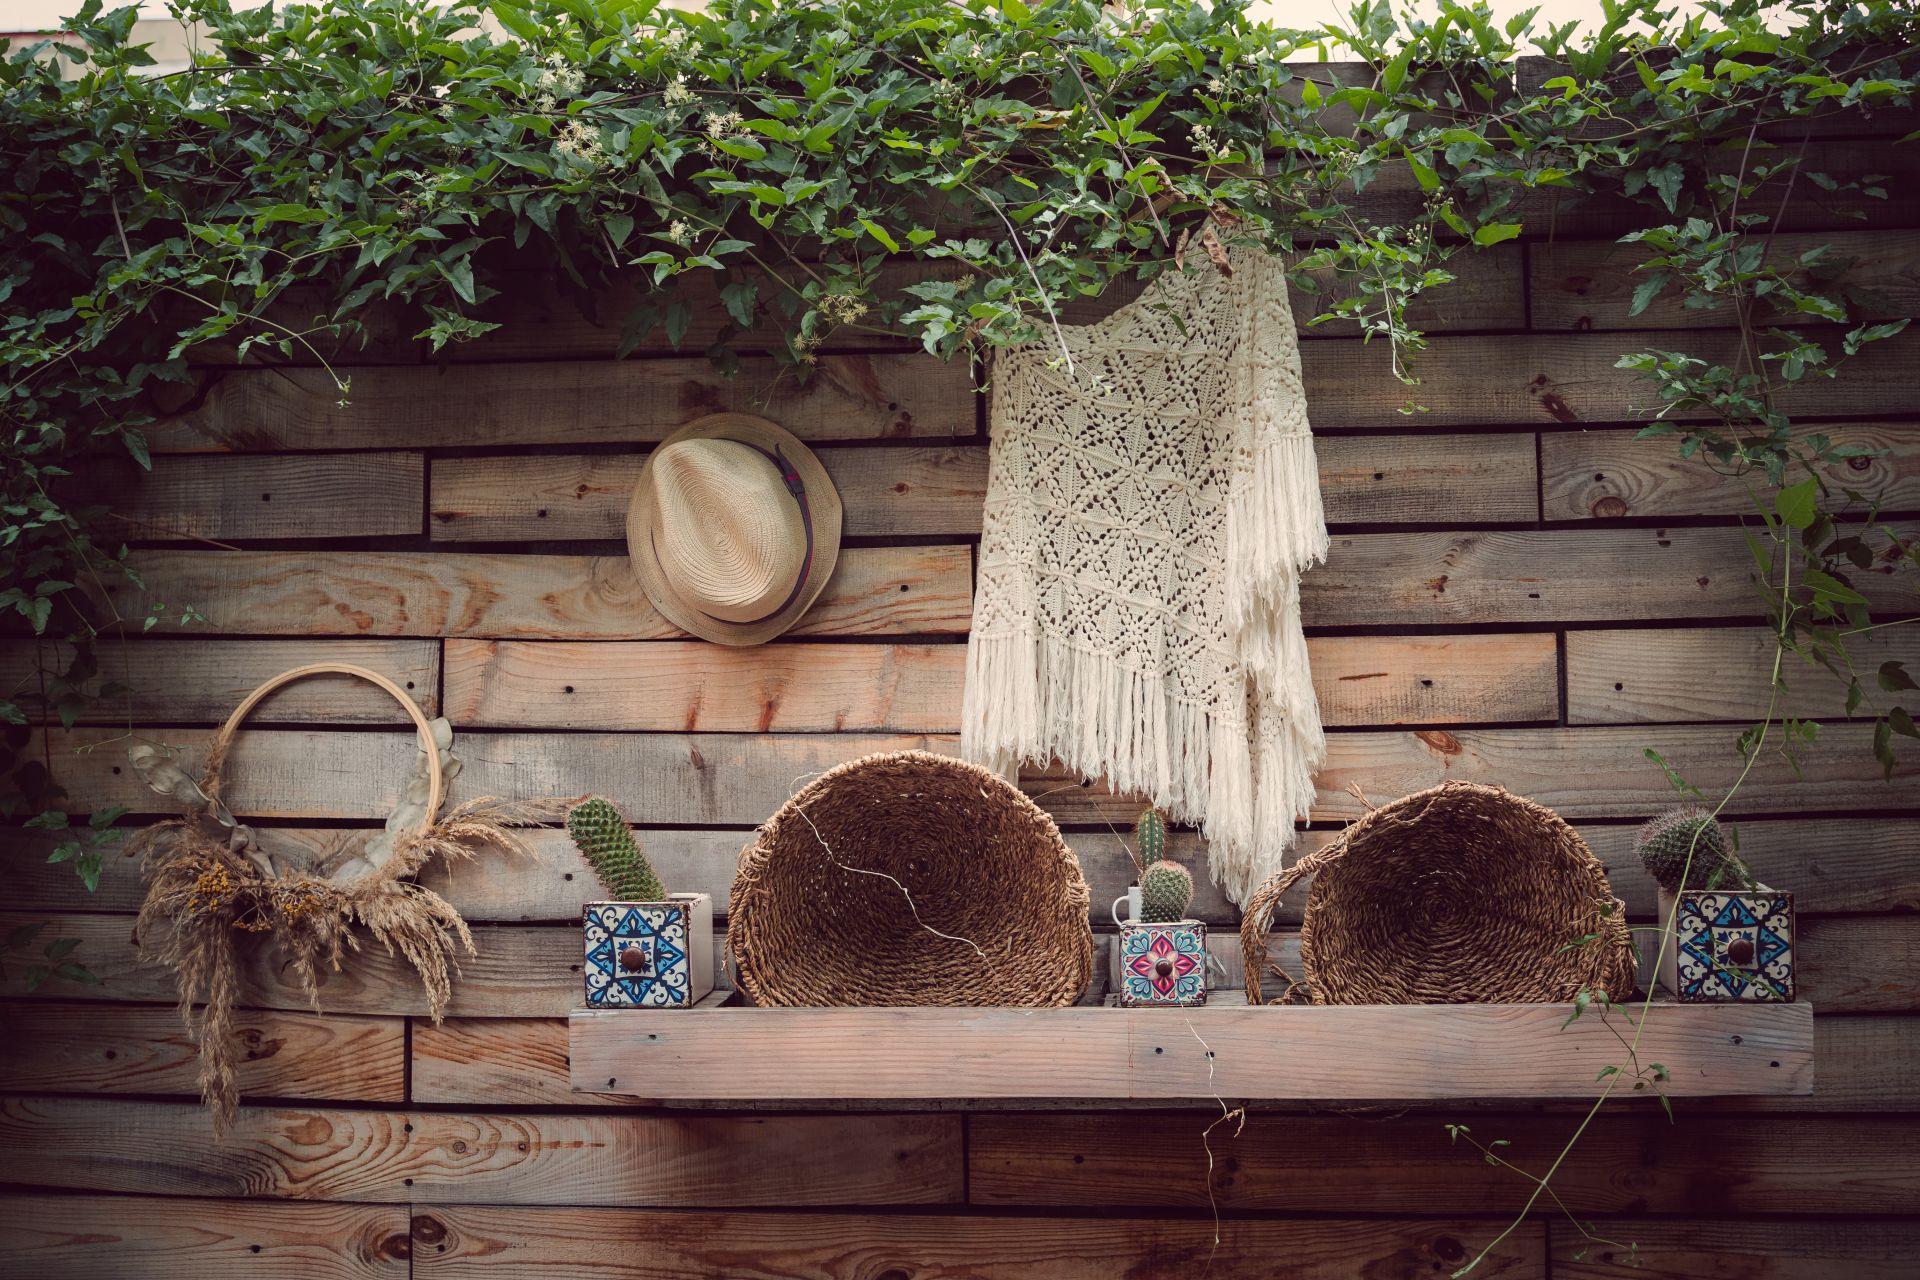 Романтично усещане в прохладния двор